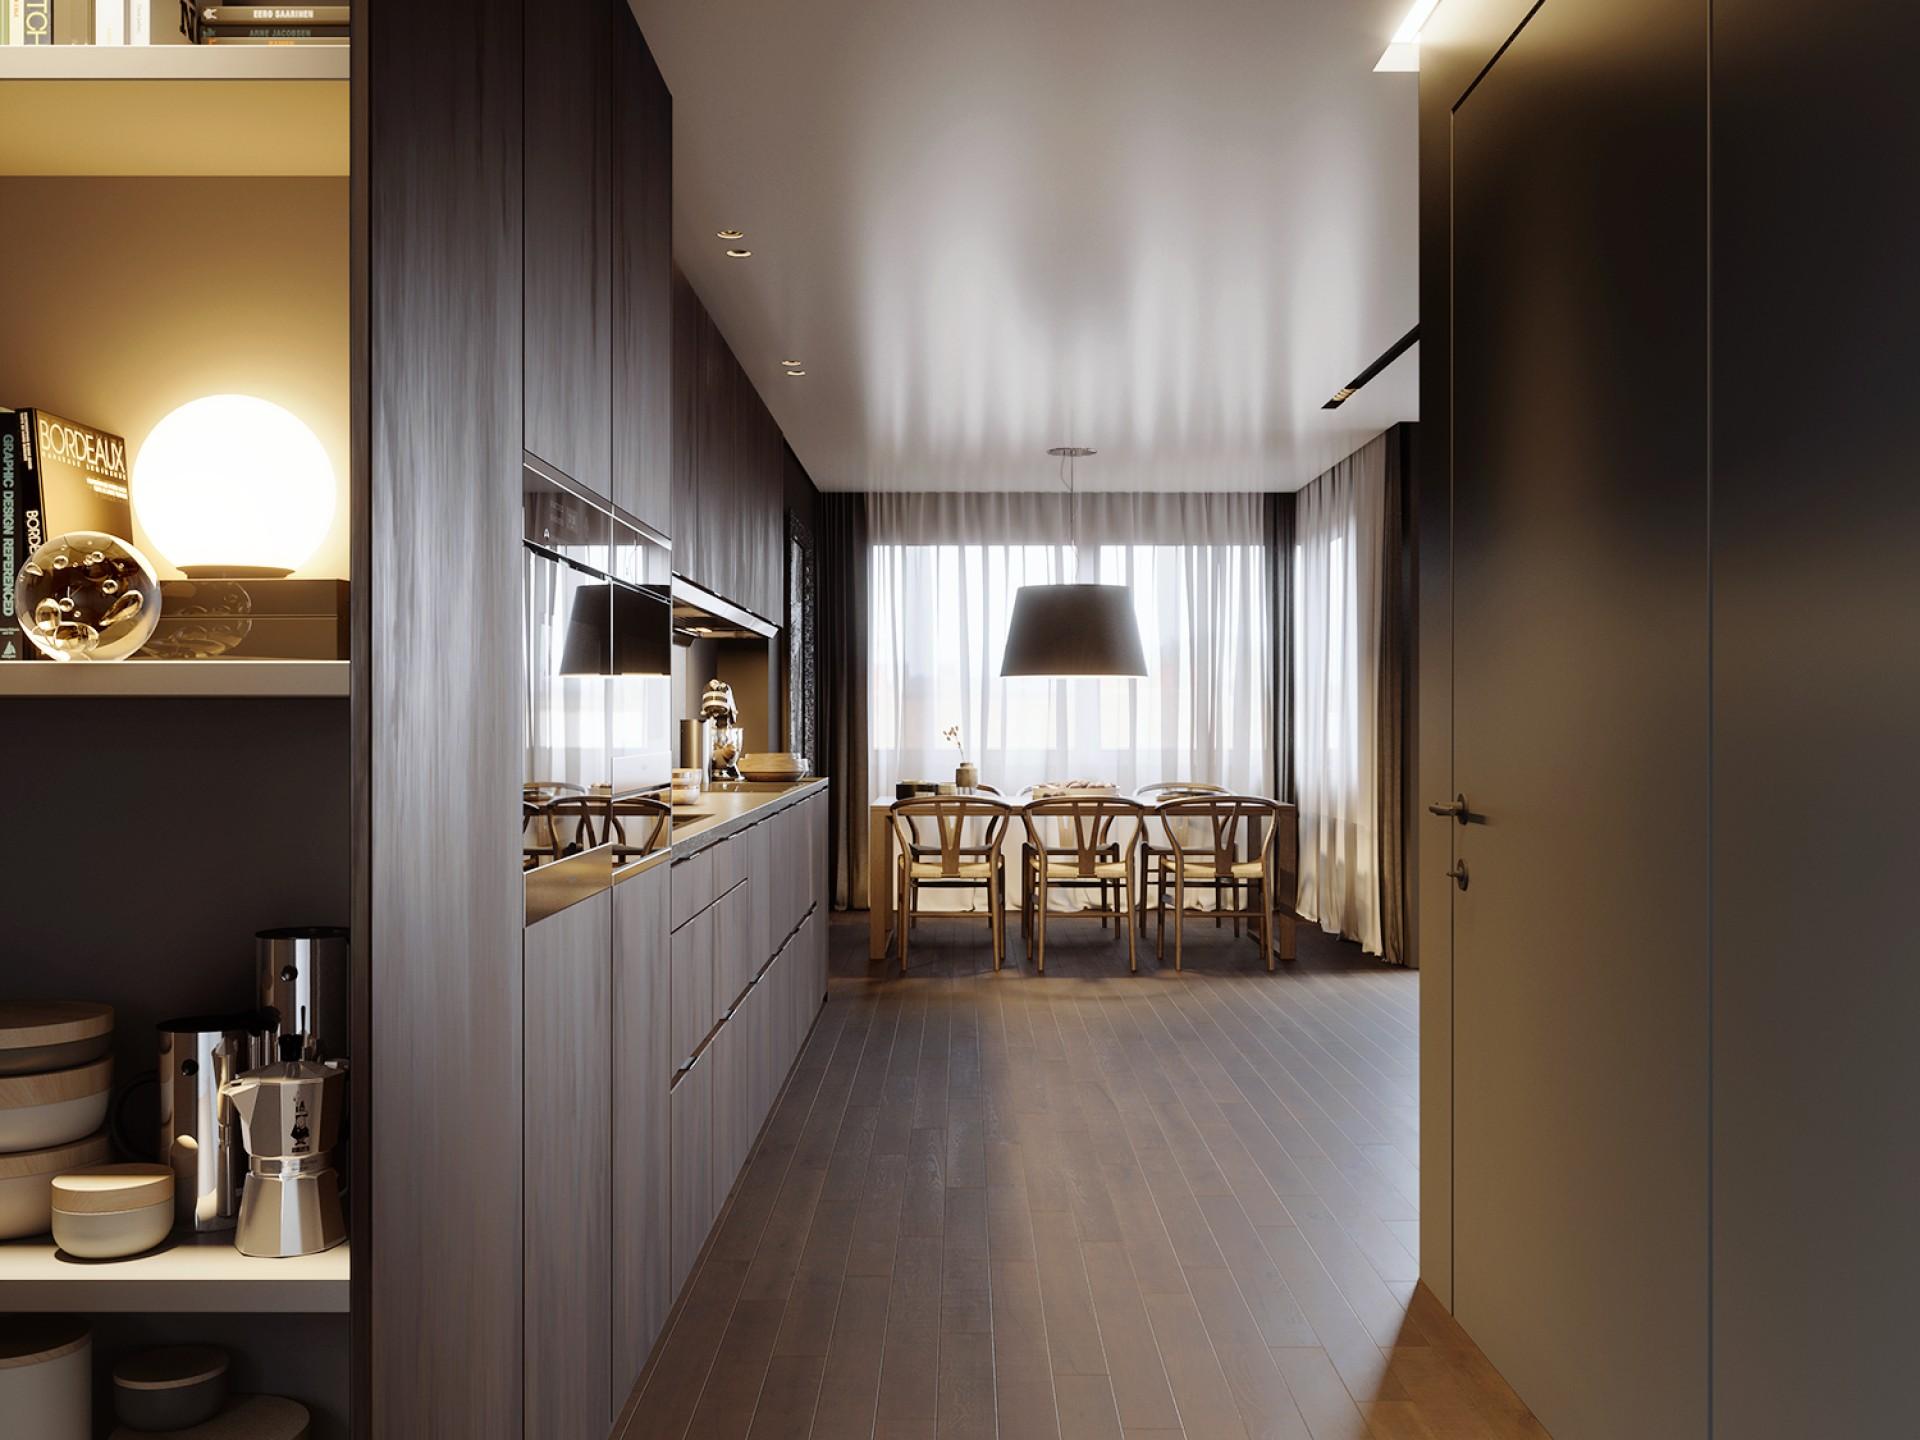 VWArtclub - Apartment in Munich